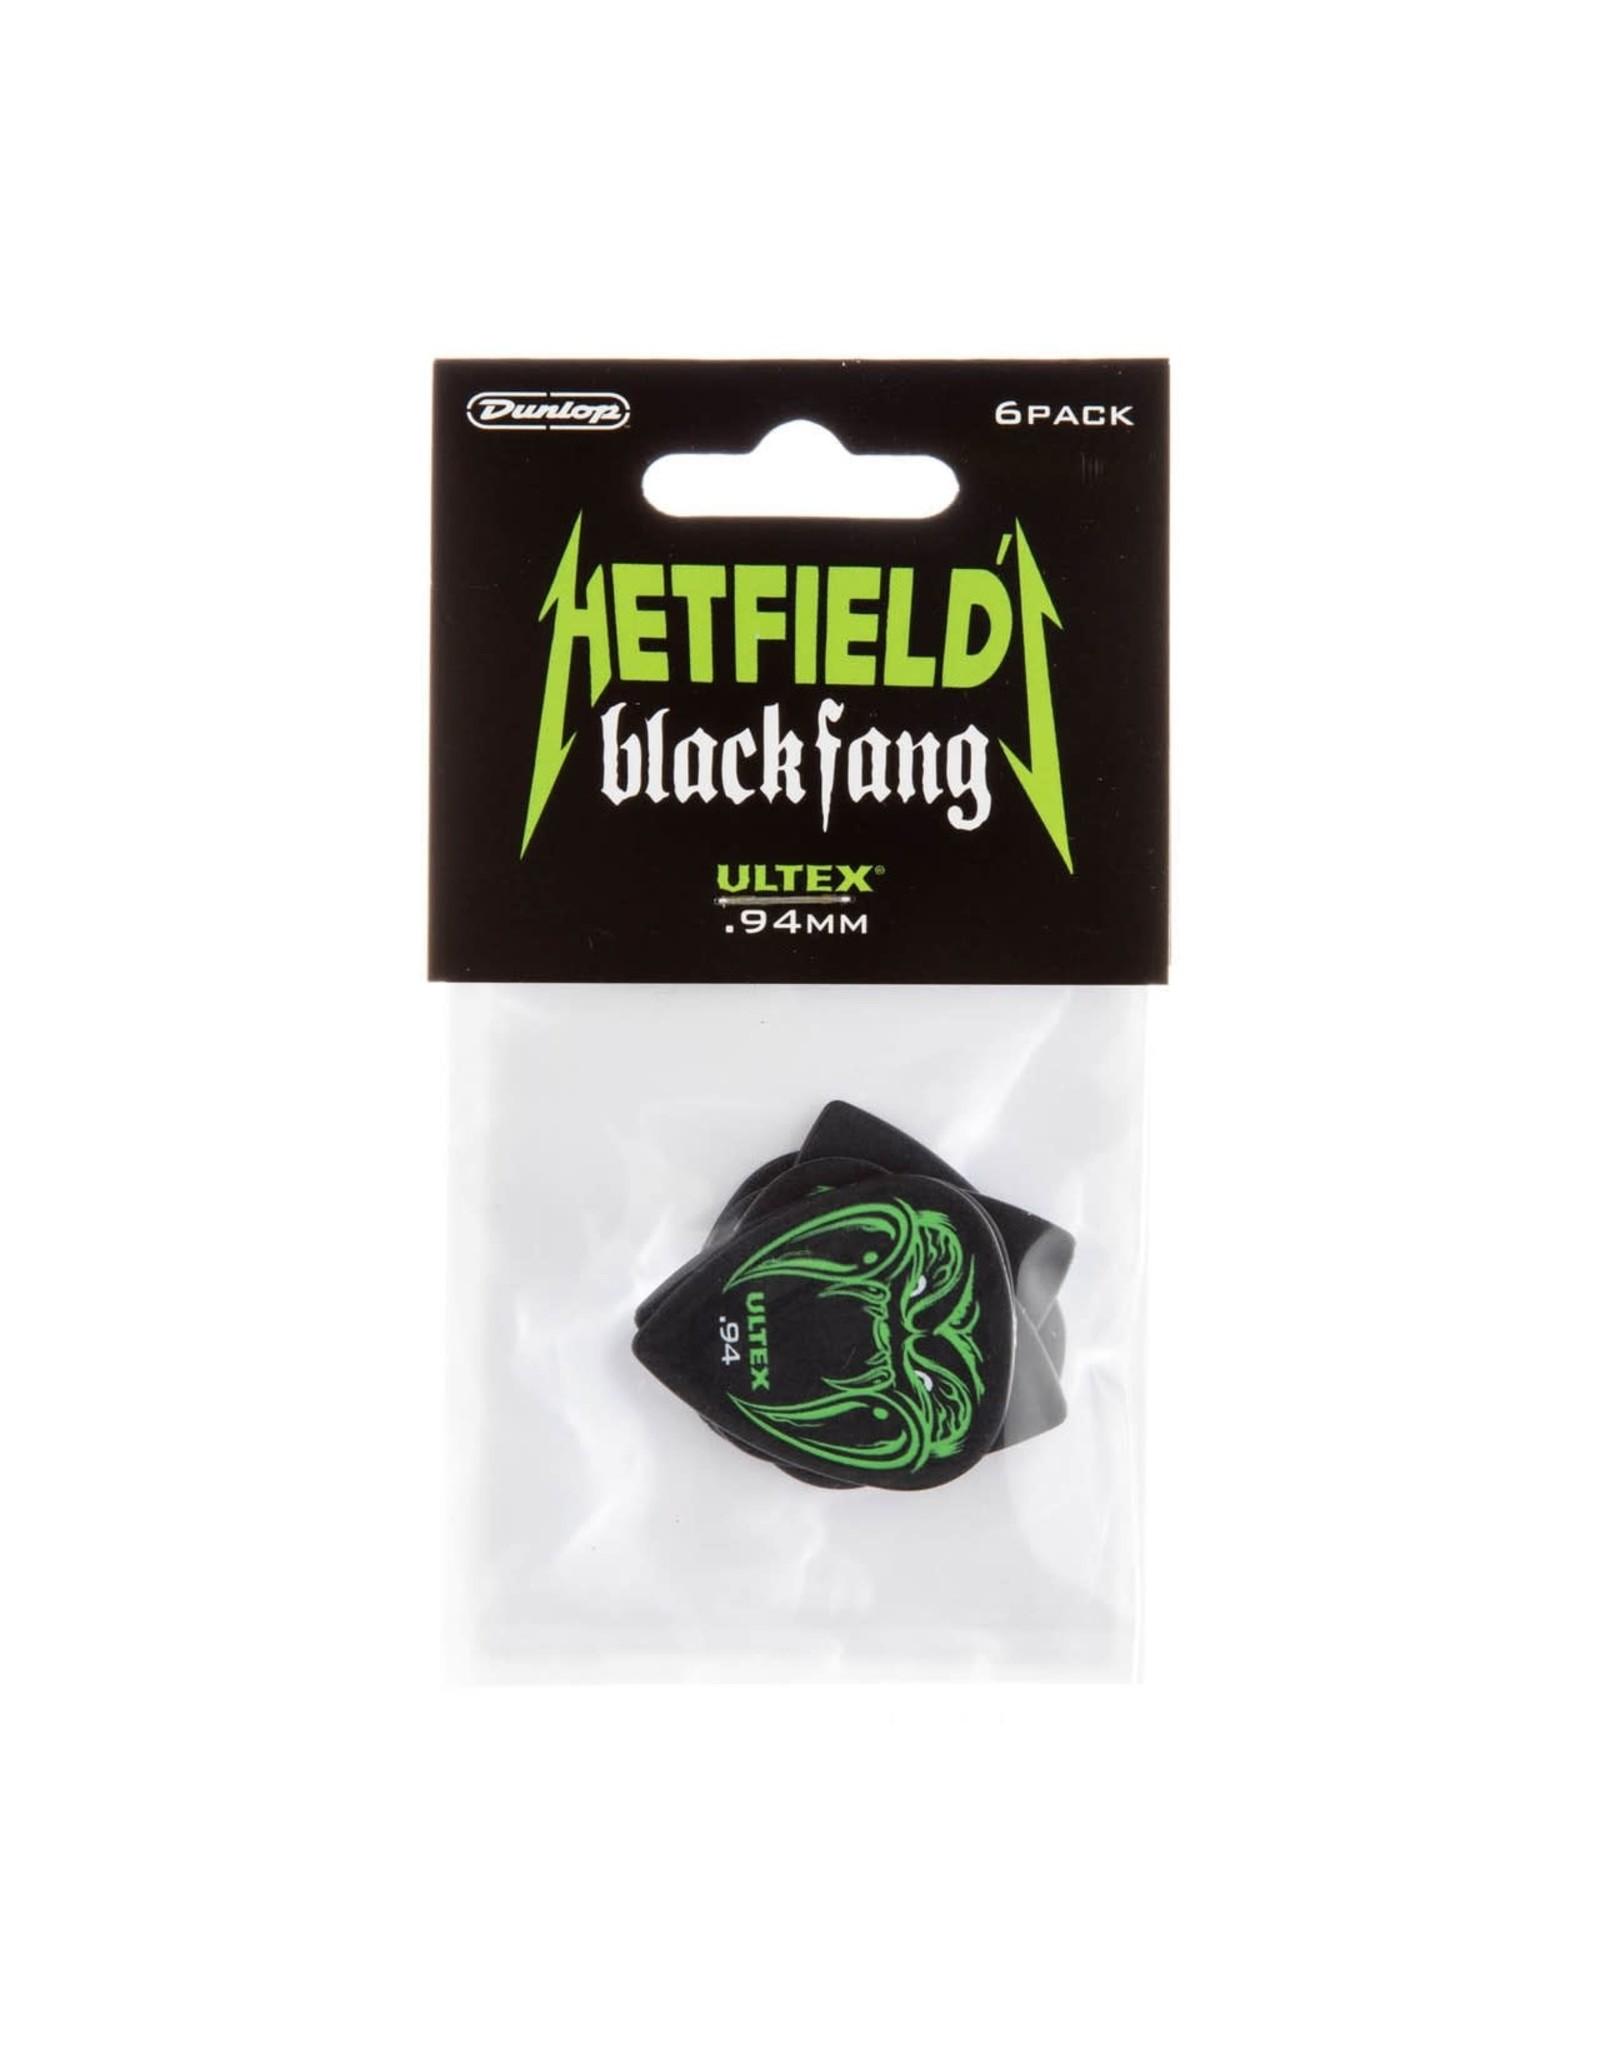 Dunlop Dunlop HETFIELD'S BLACK FANG PICK .94MM